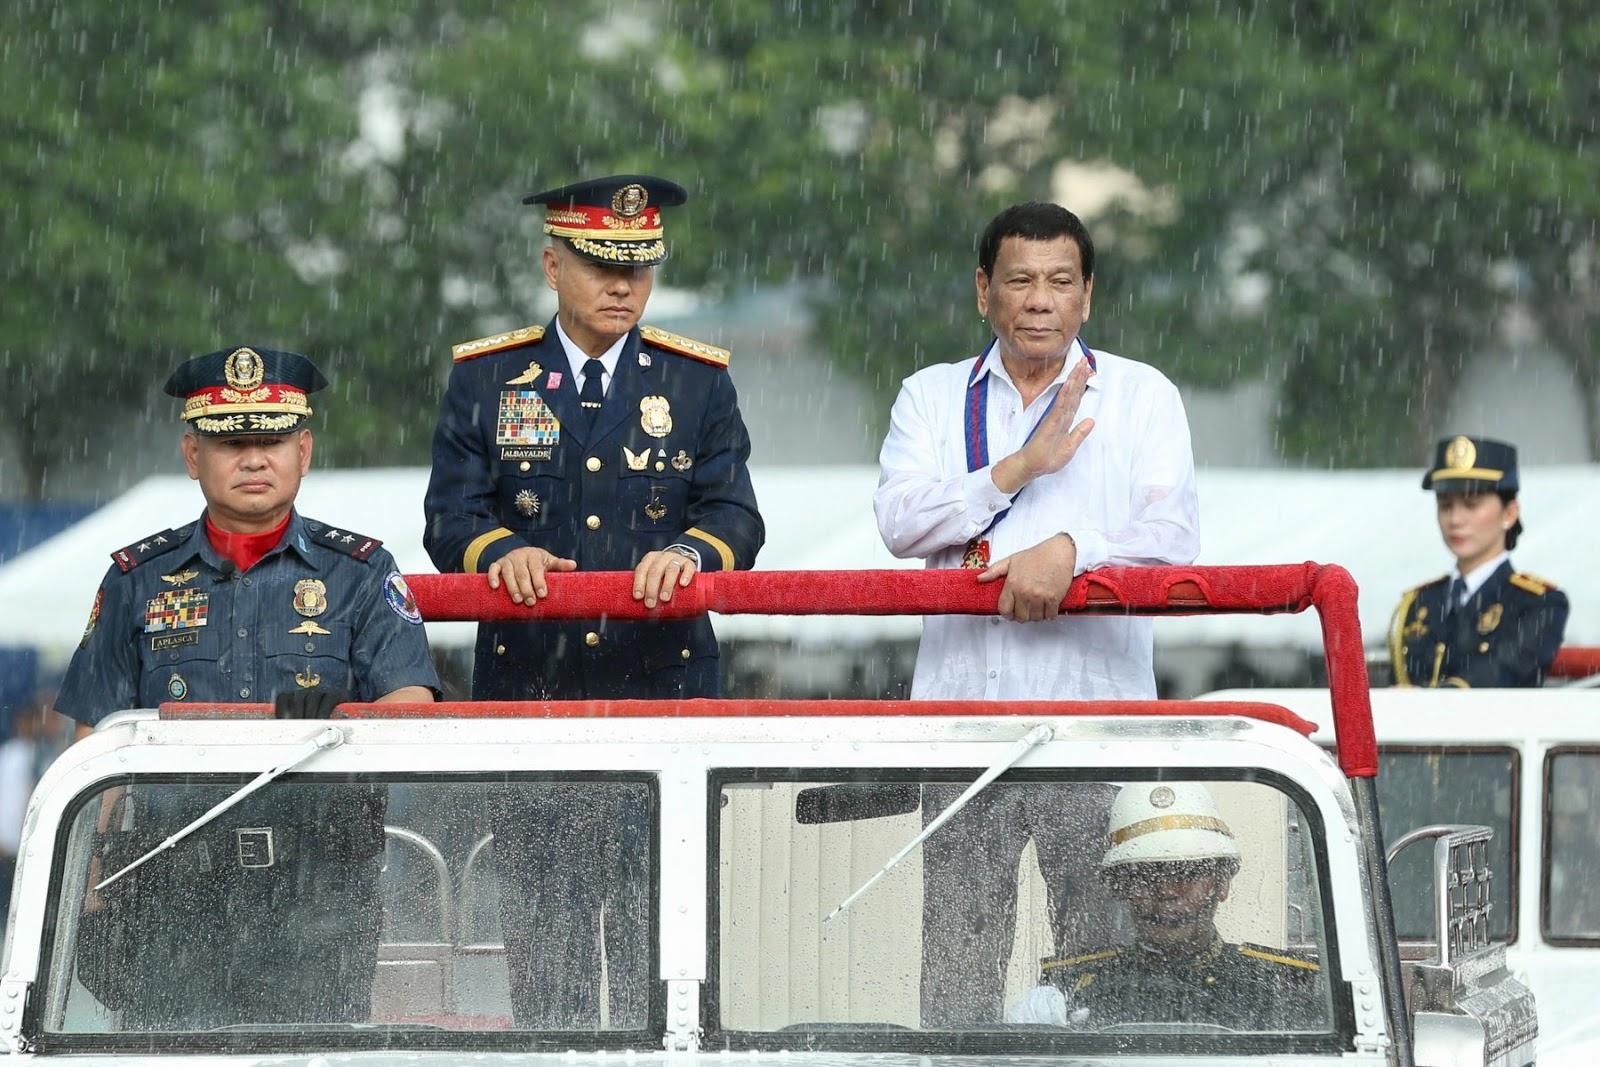 Asian national hero